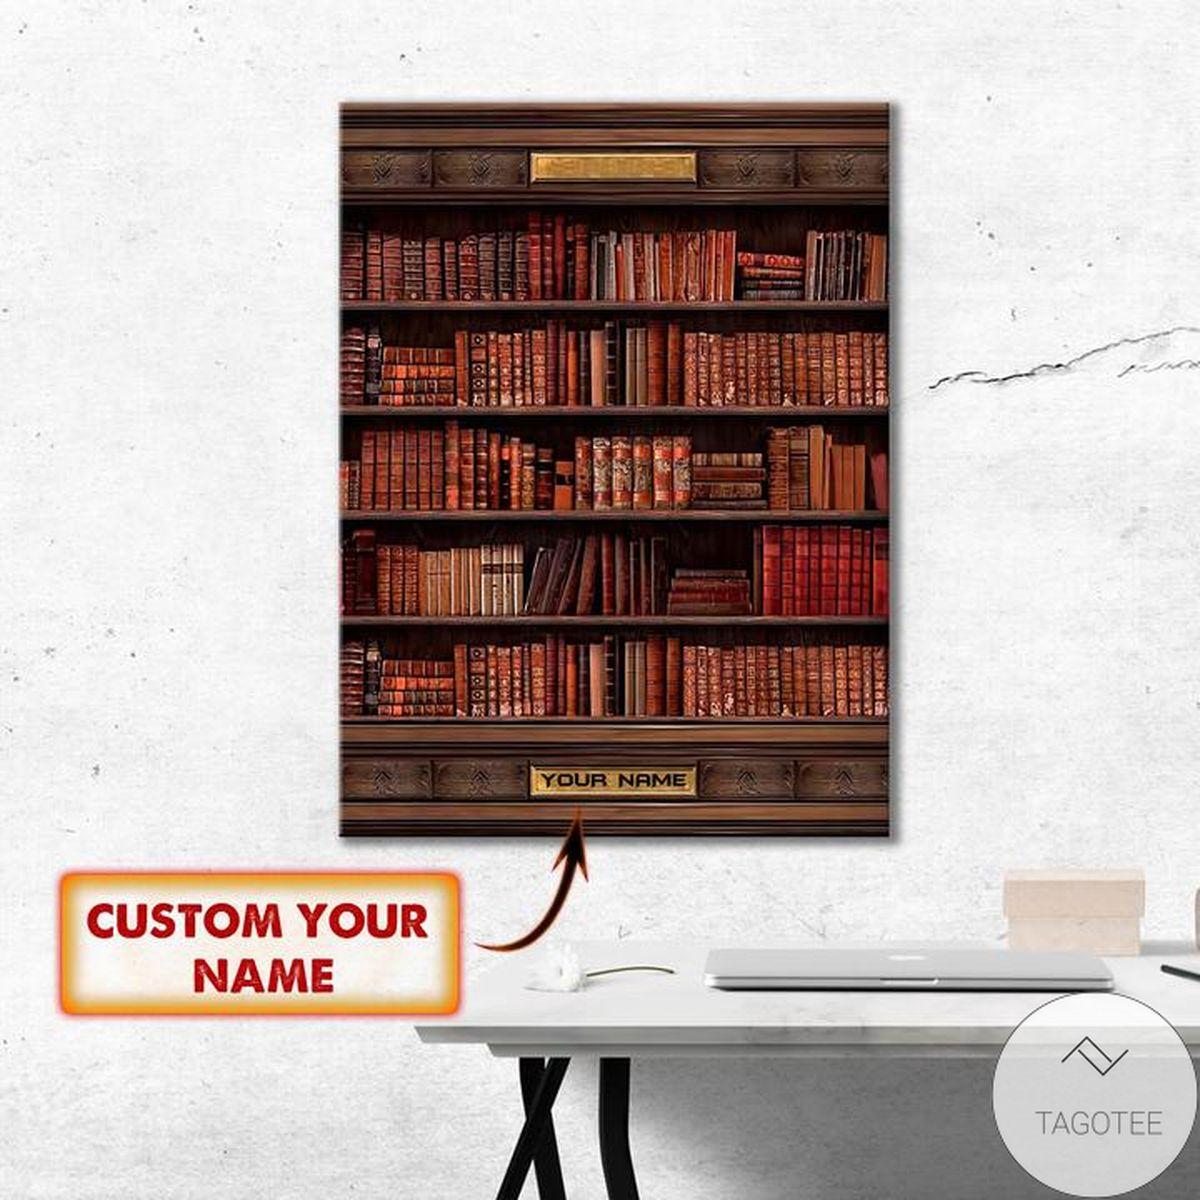 Personalized Book Shelf Ornament